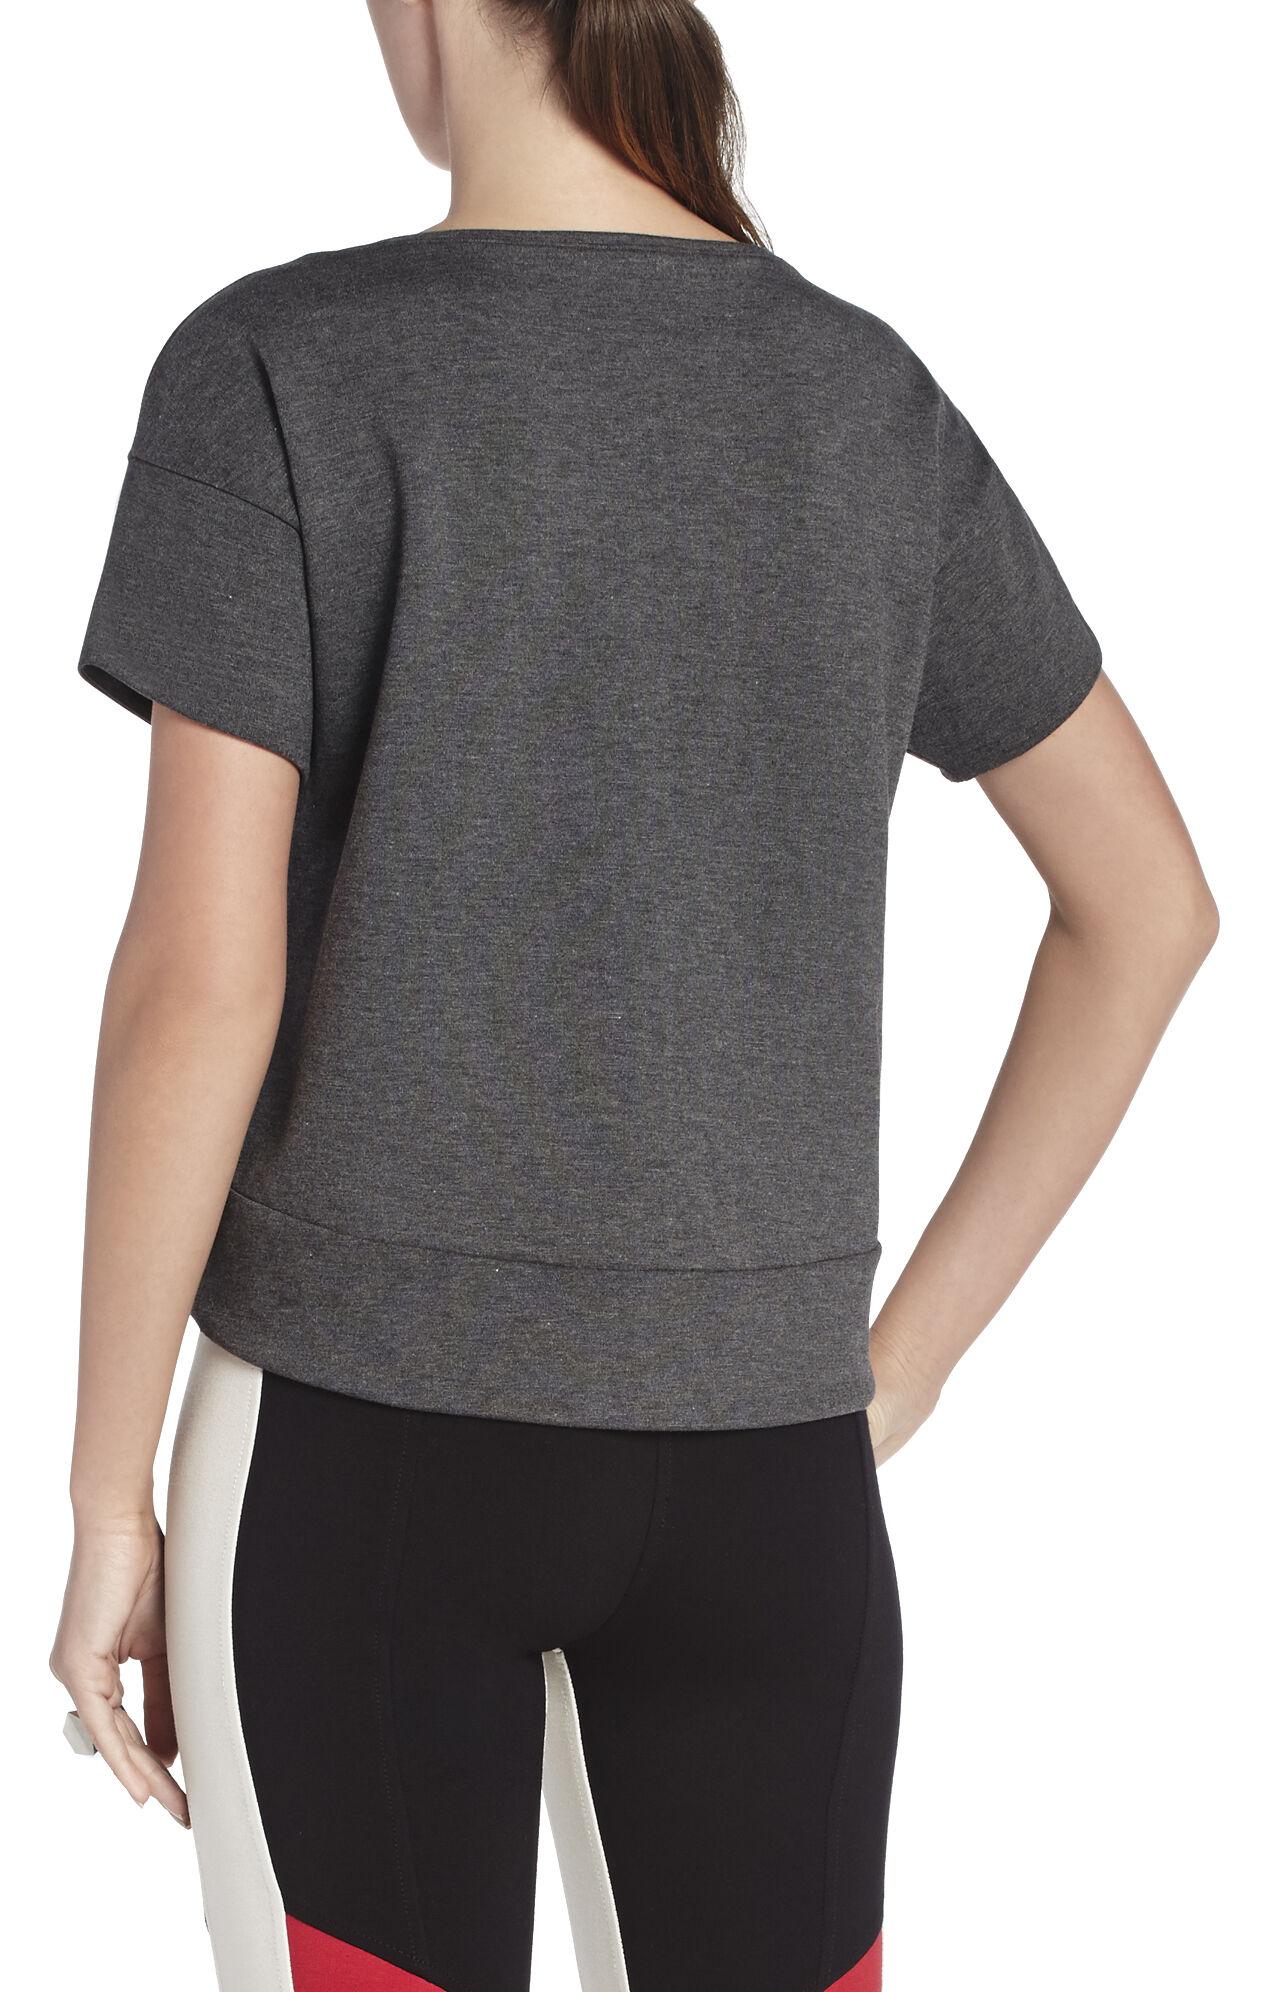 Tian Ponte T-Shirt